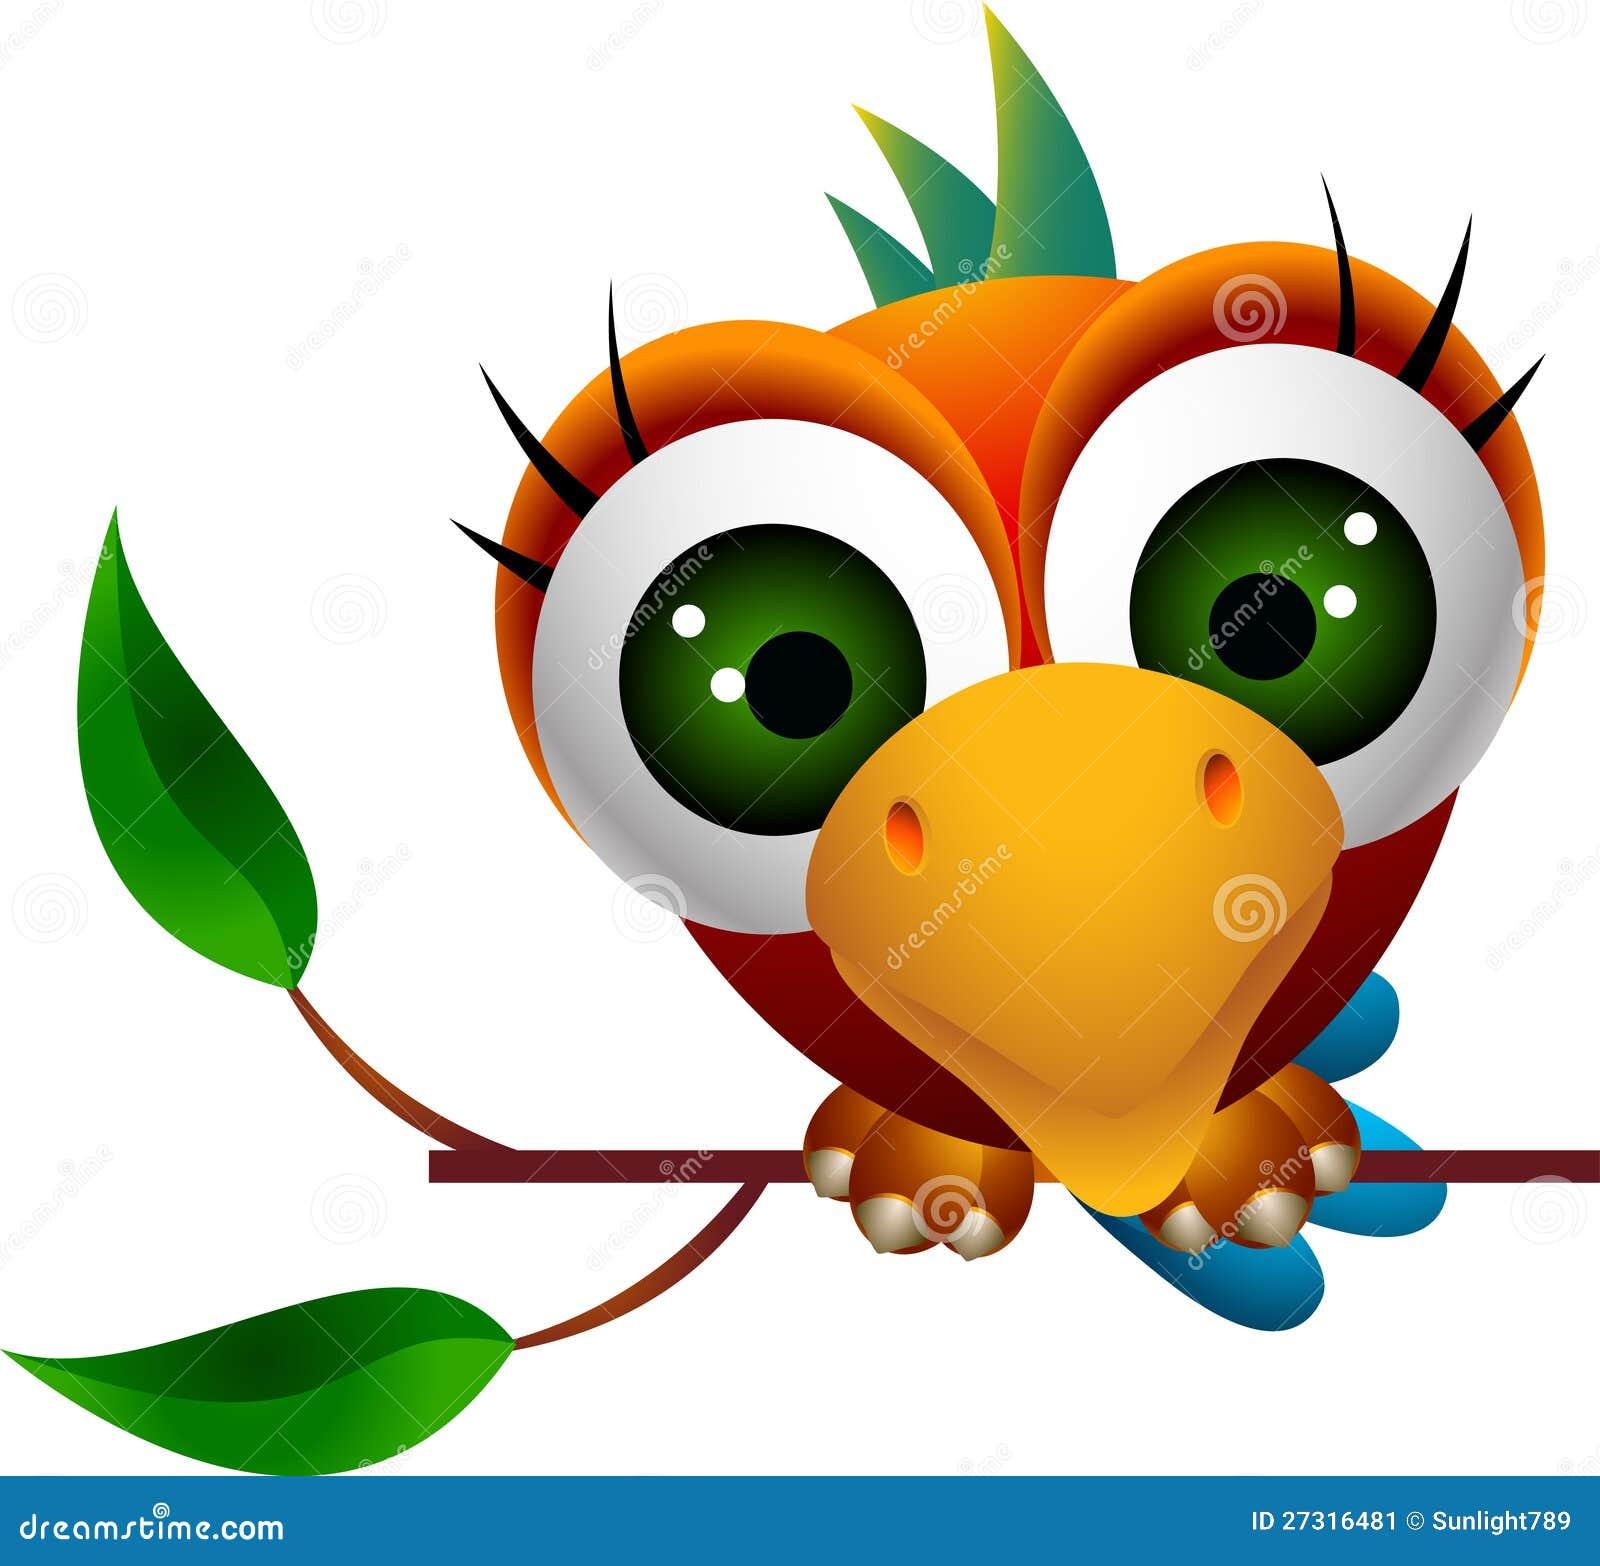 Cute Macaw Bird Cartoon Stock Image - Image: 27316481